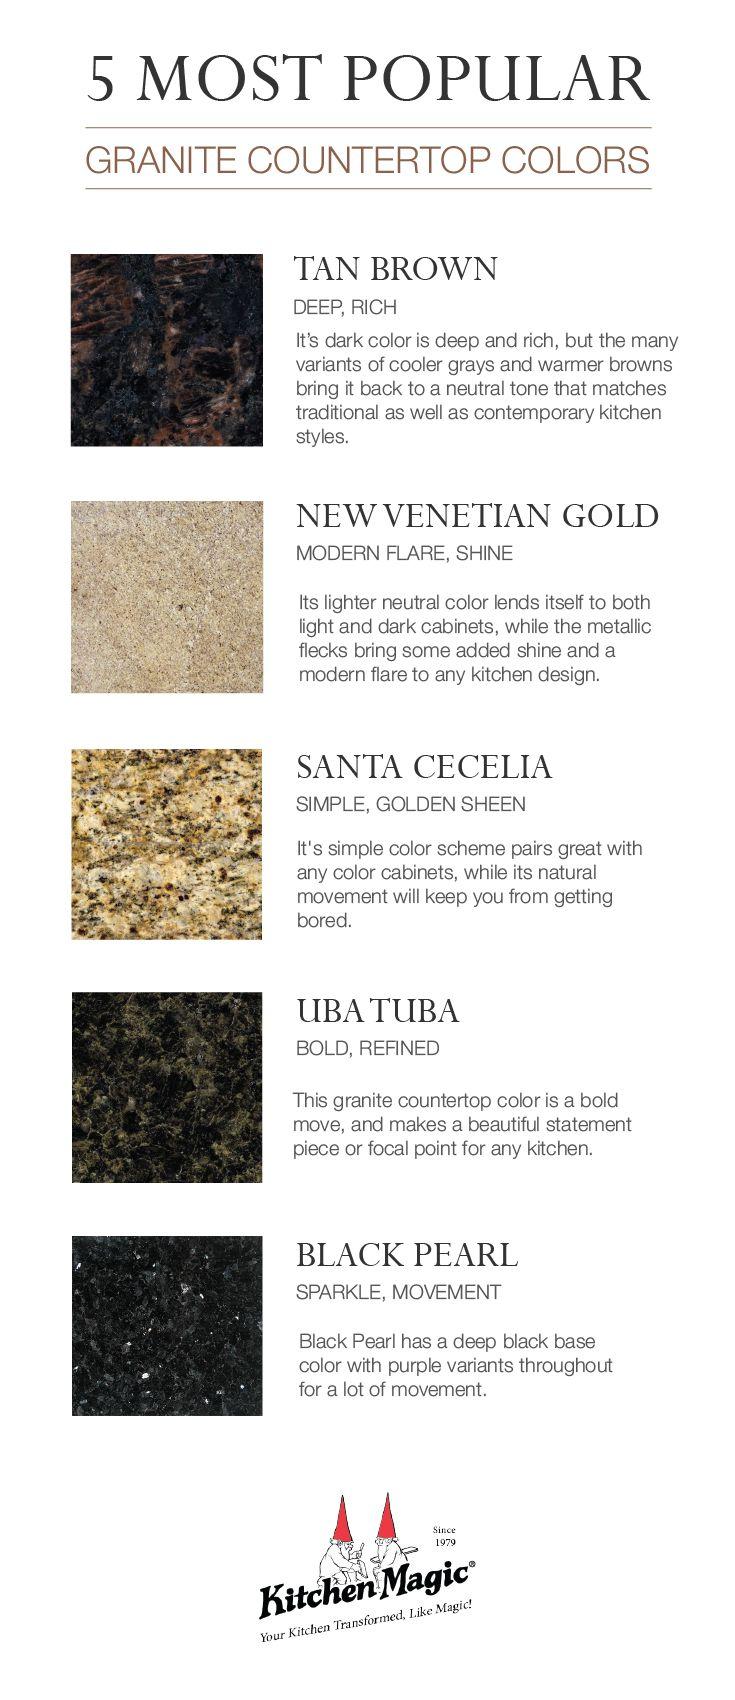 Most popular granite countertop colors 2015 - 5 Most Popular Granite Countertop Colors